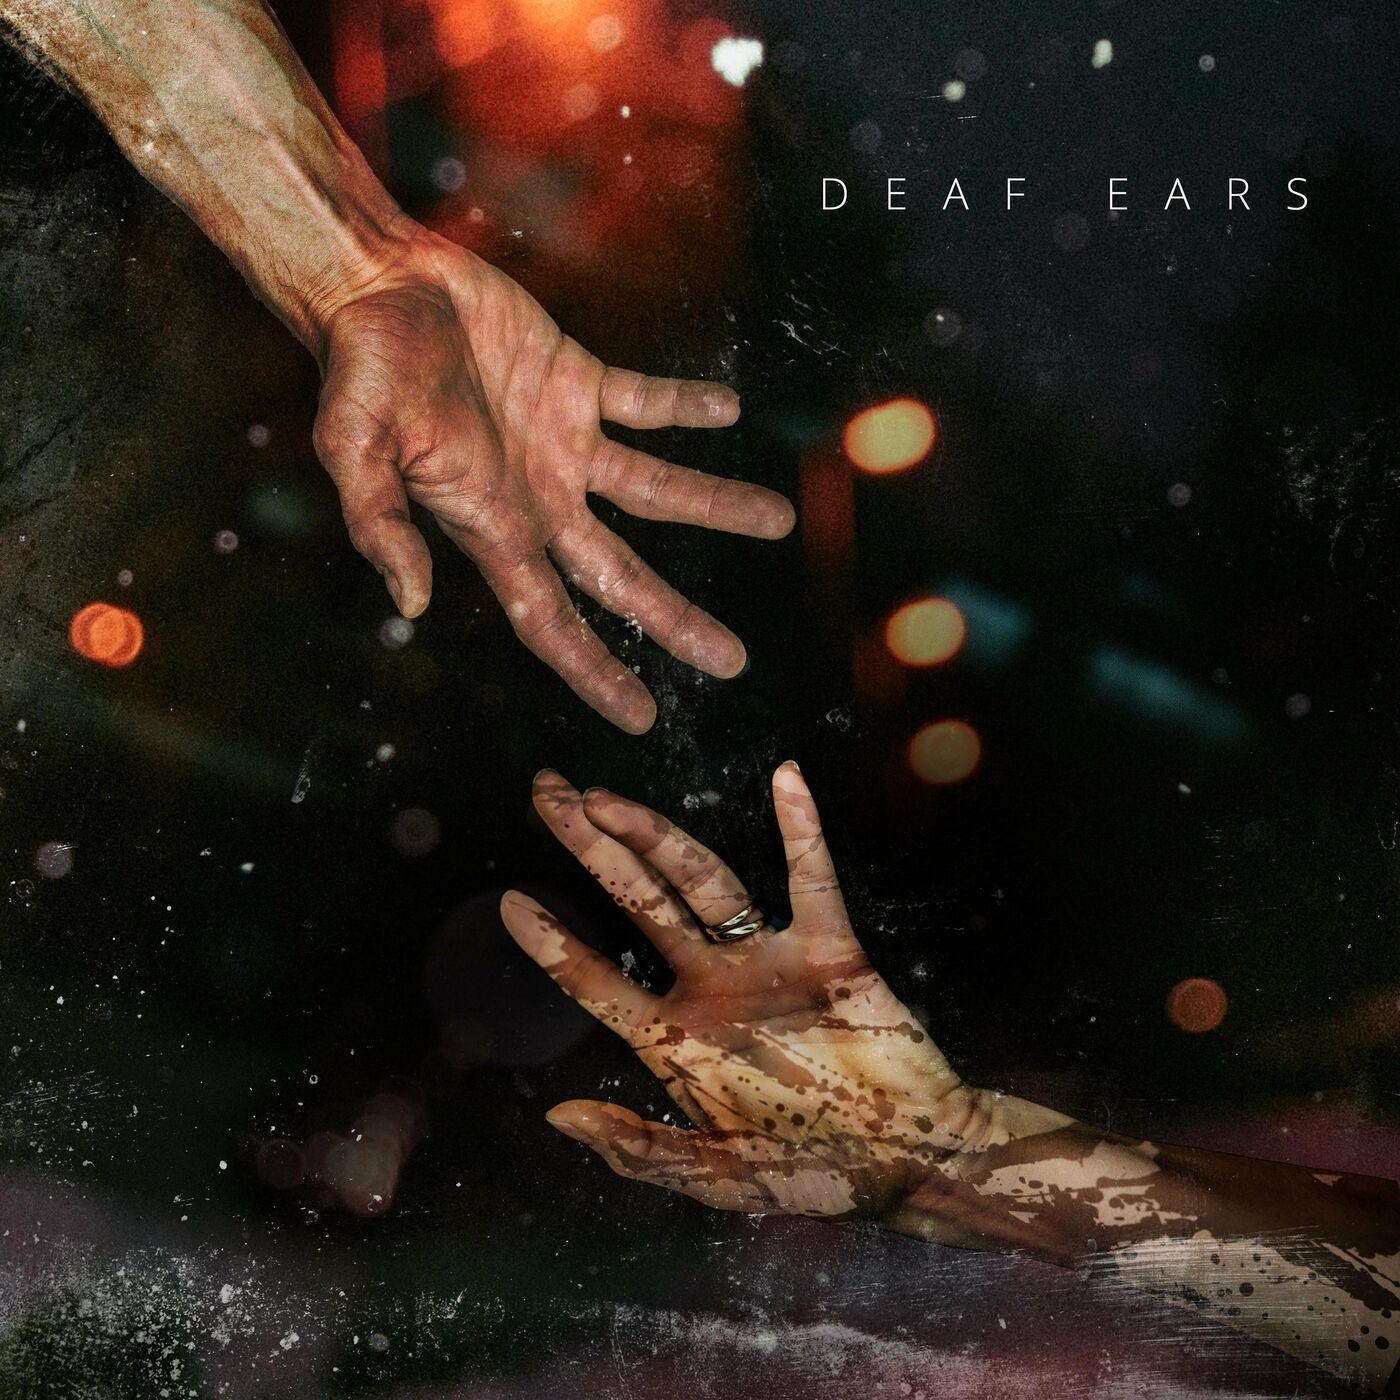 Torrential Rain - Deaf Ears [single] (2020)